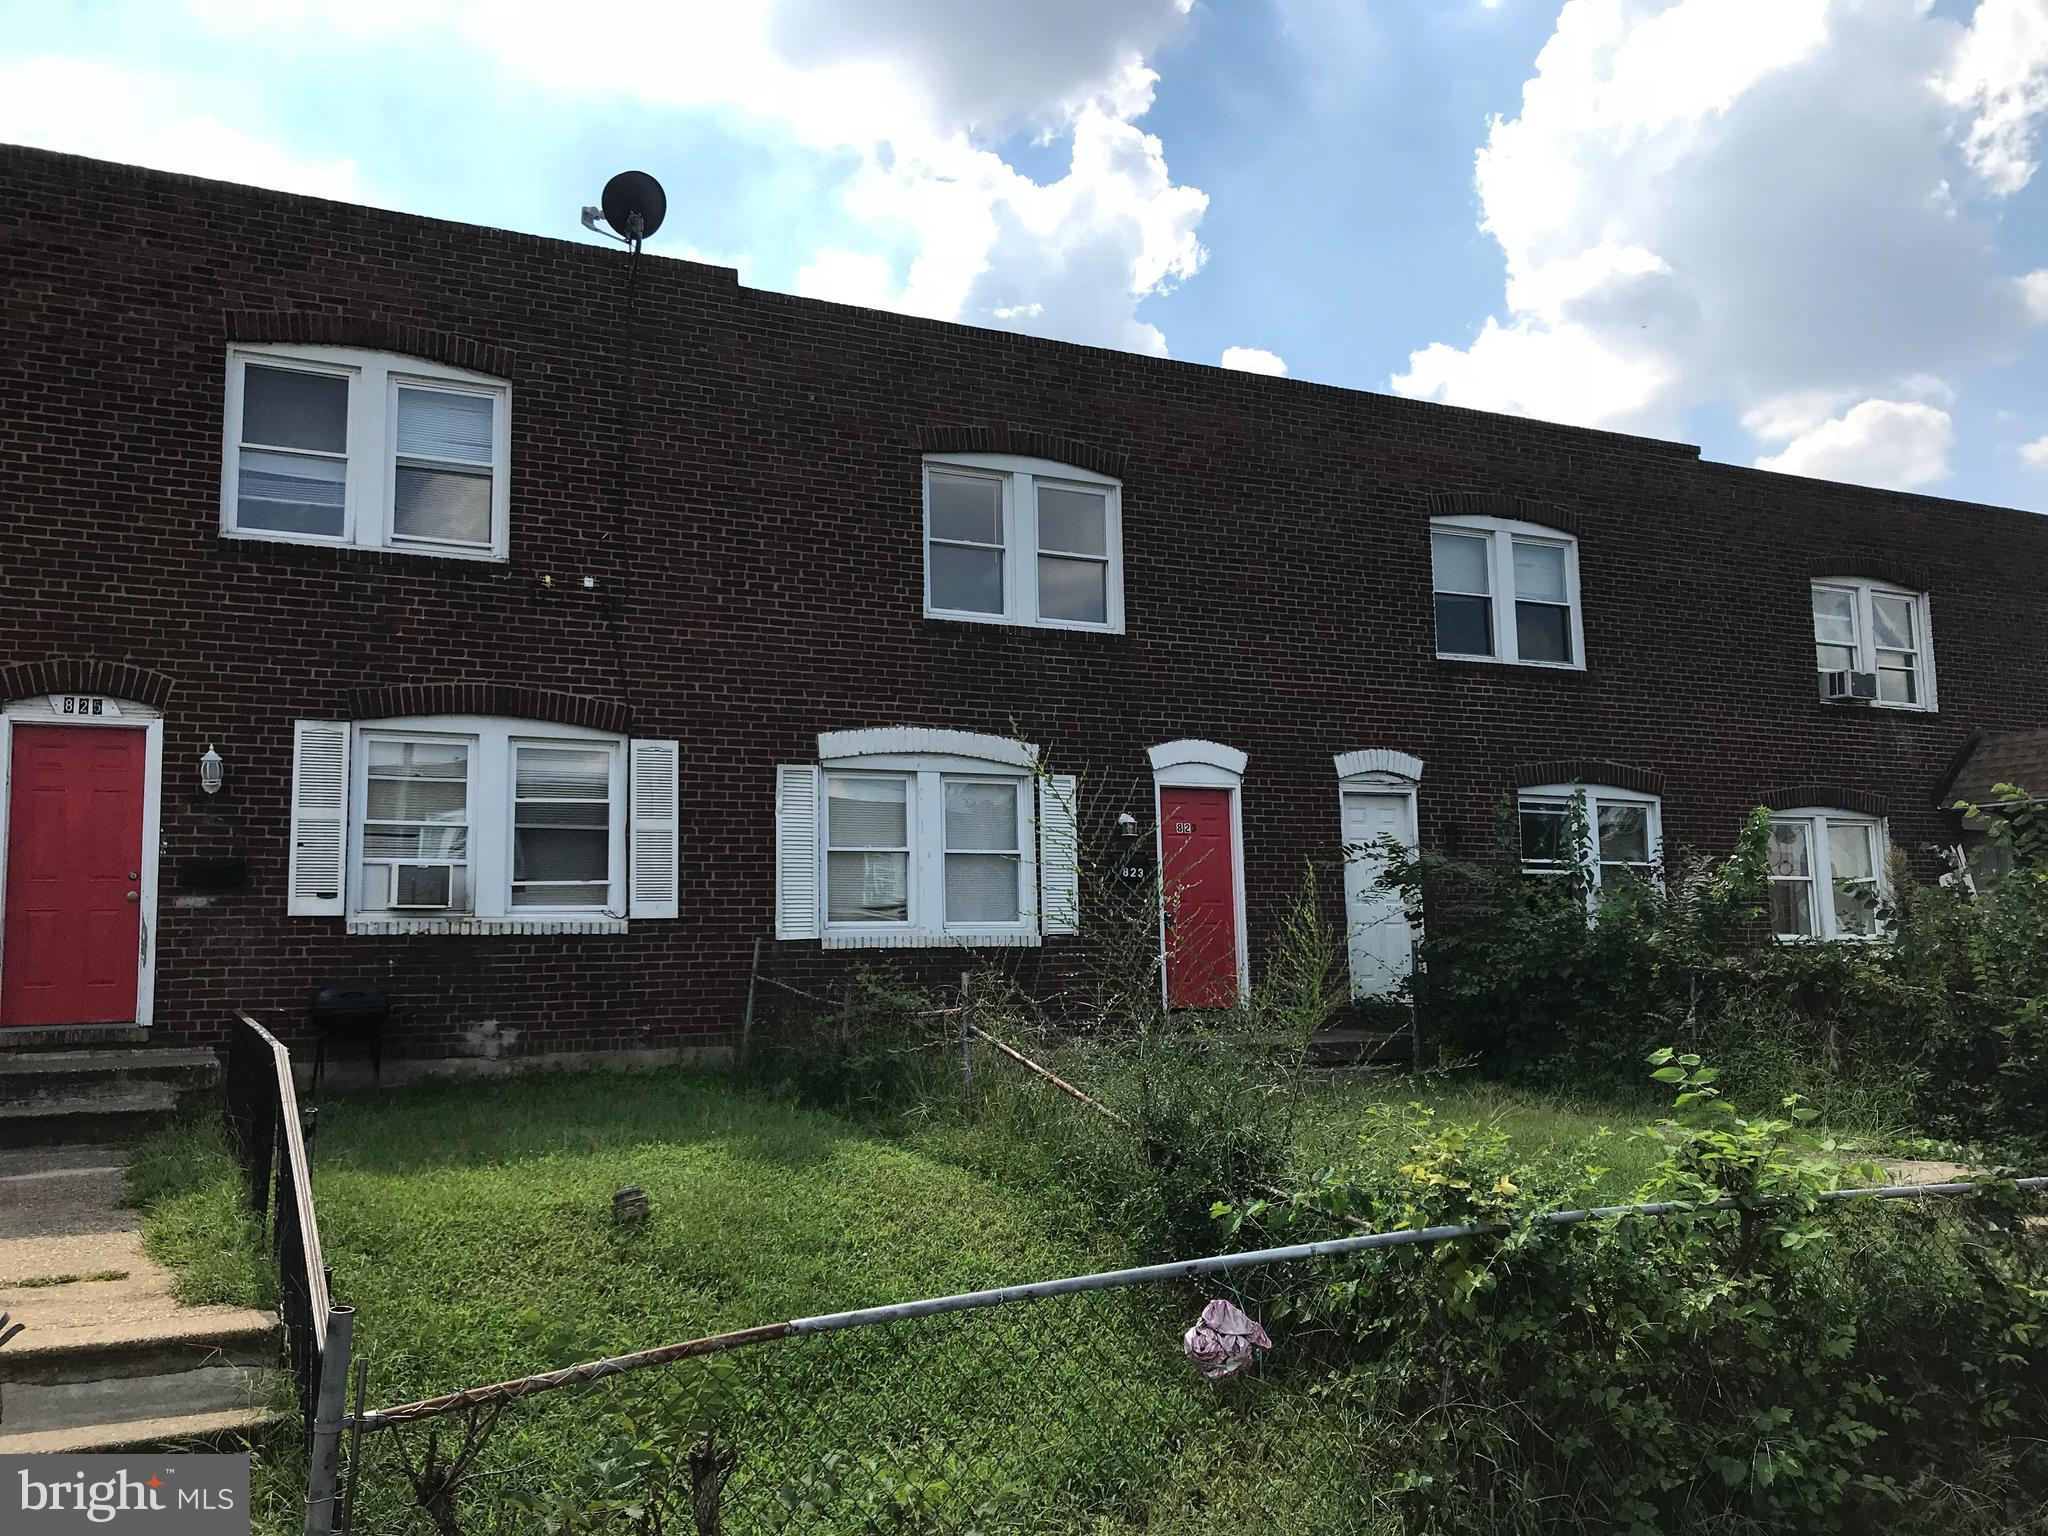 823 STOLL STREET, Baltimore, MD 21225